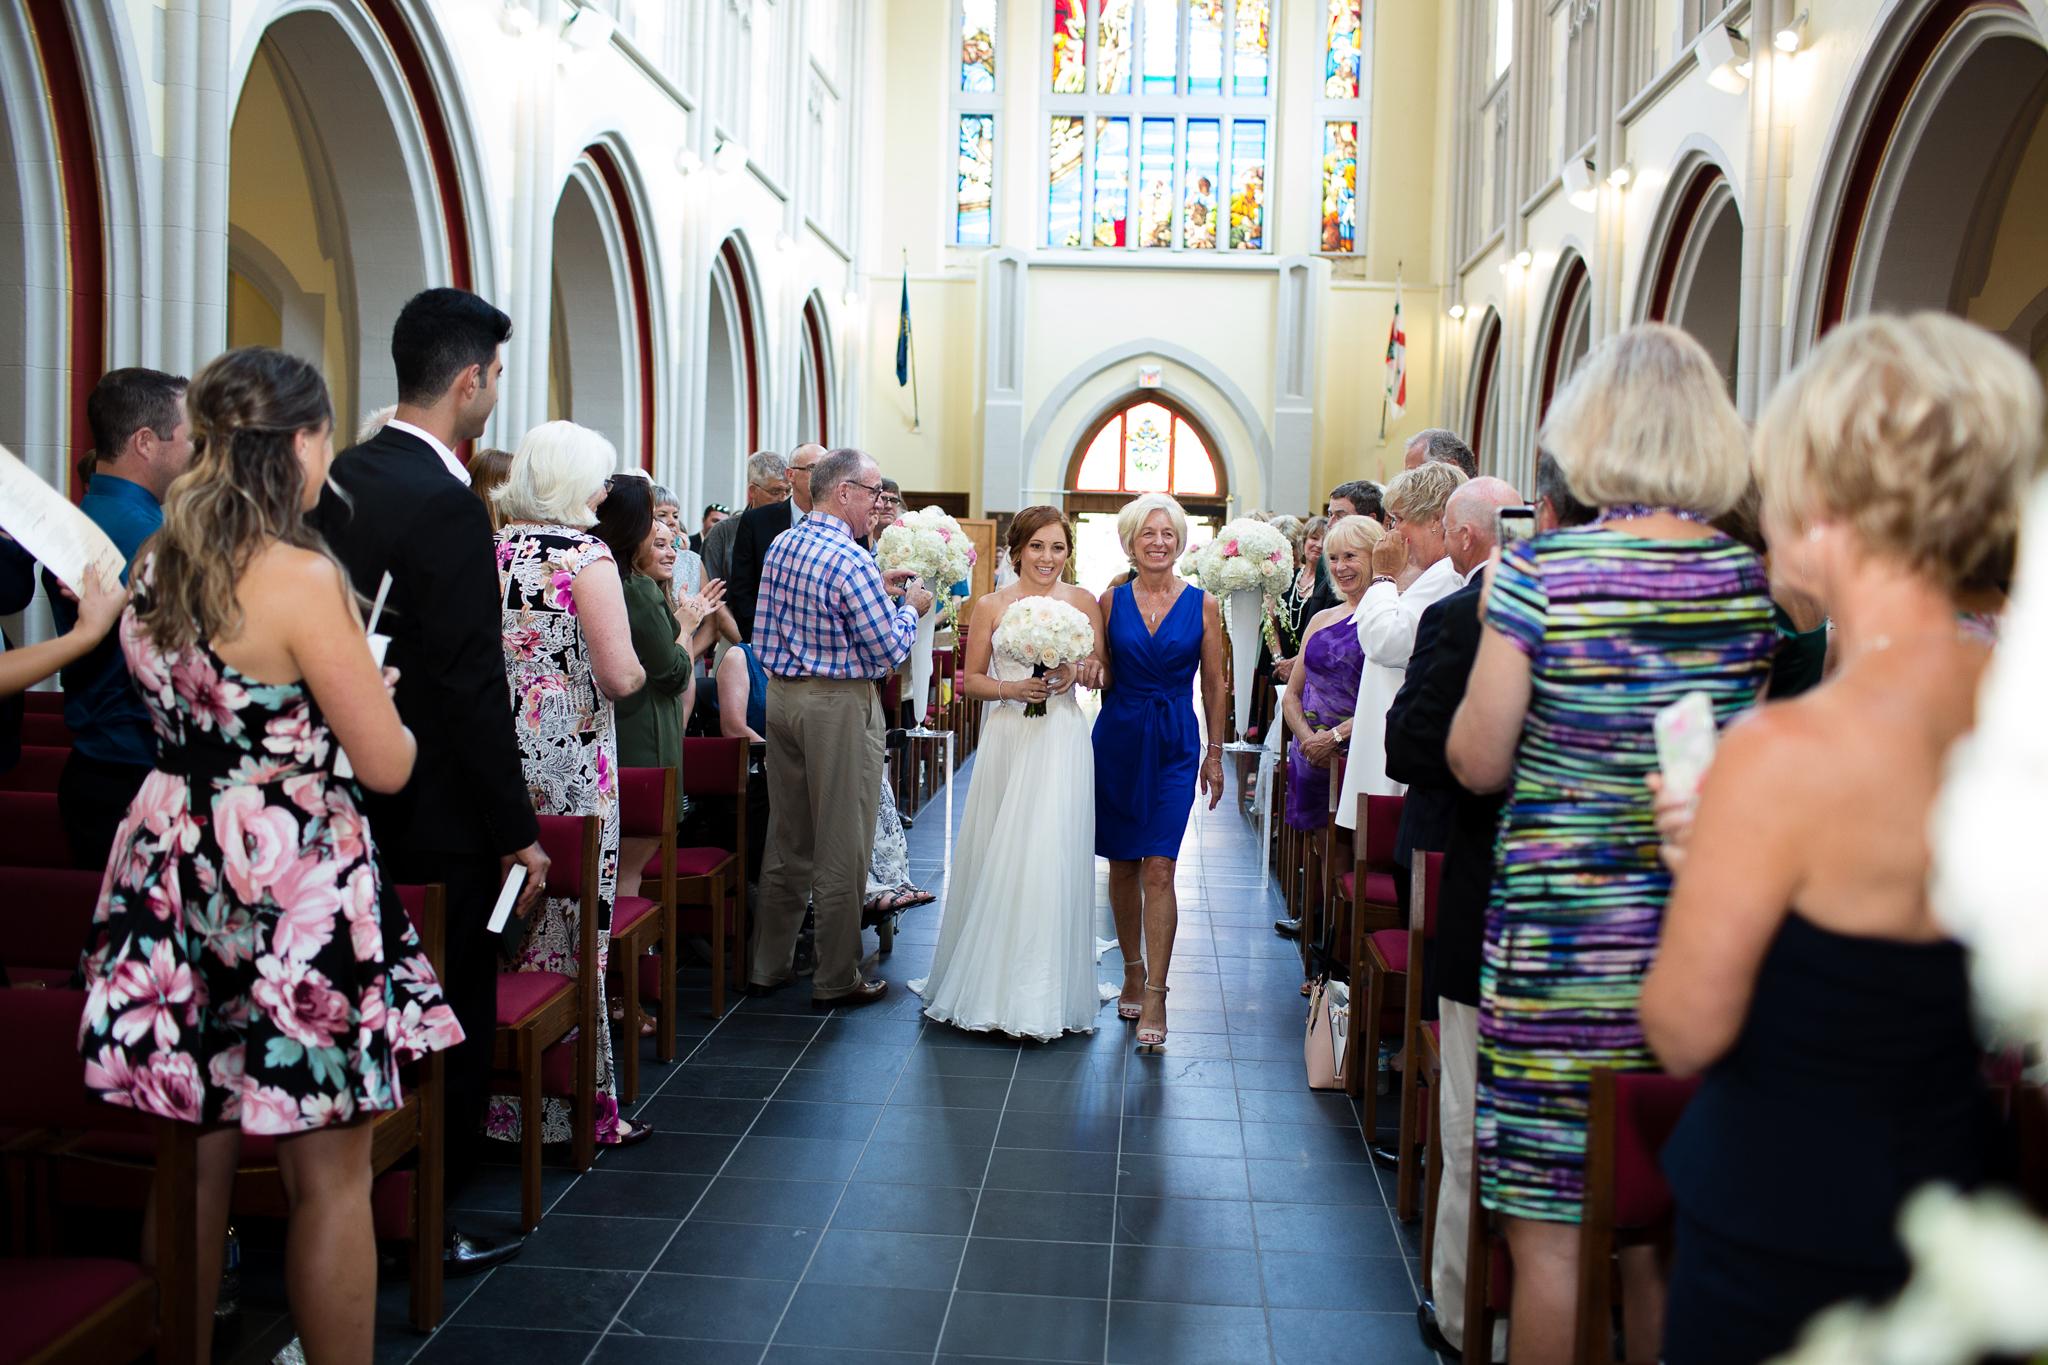 08-LORD-NELSON-WEDDING-VENUE-HALIFAX.jpg